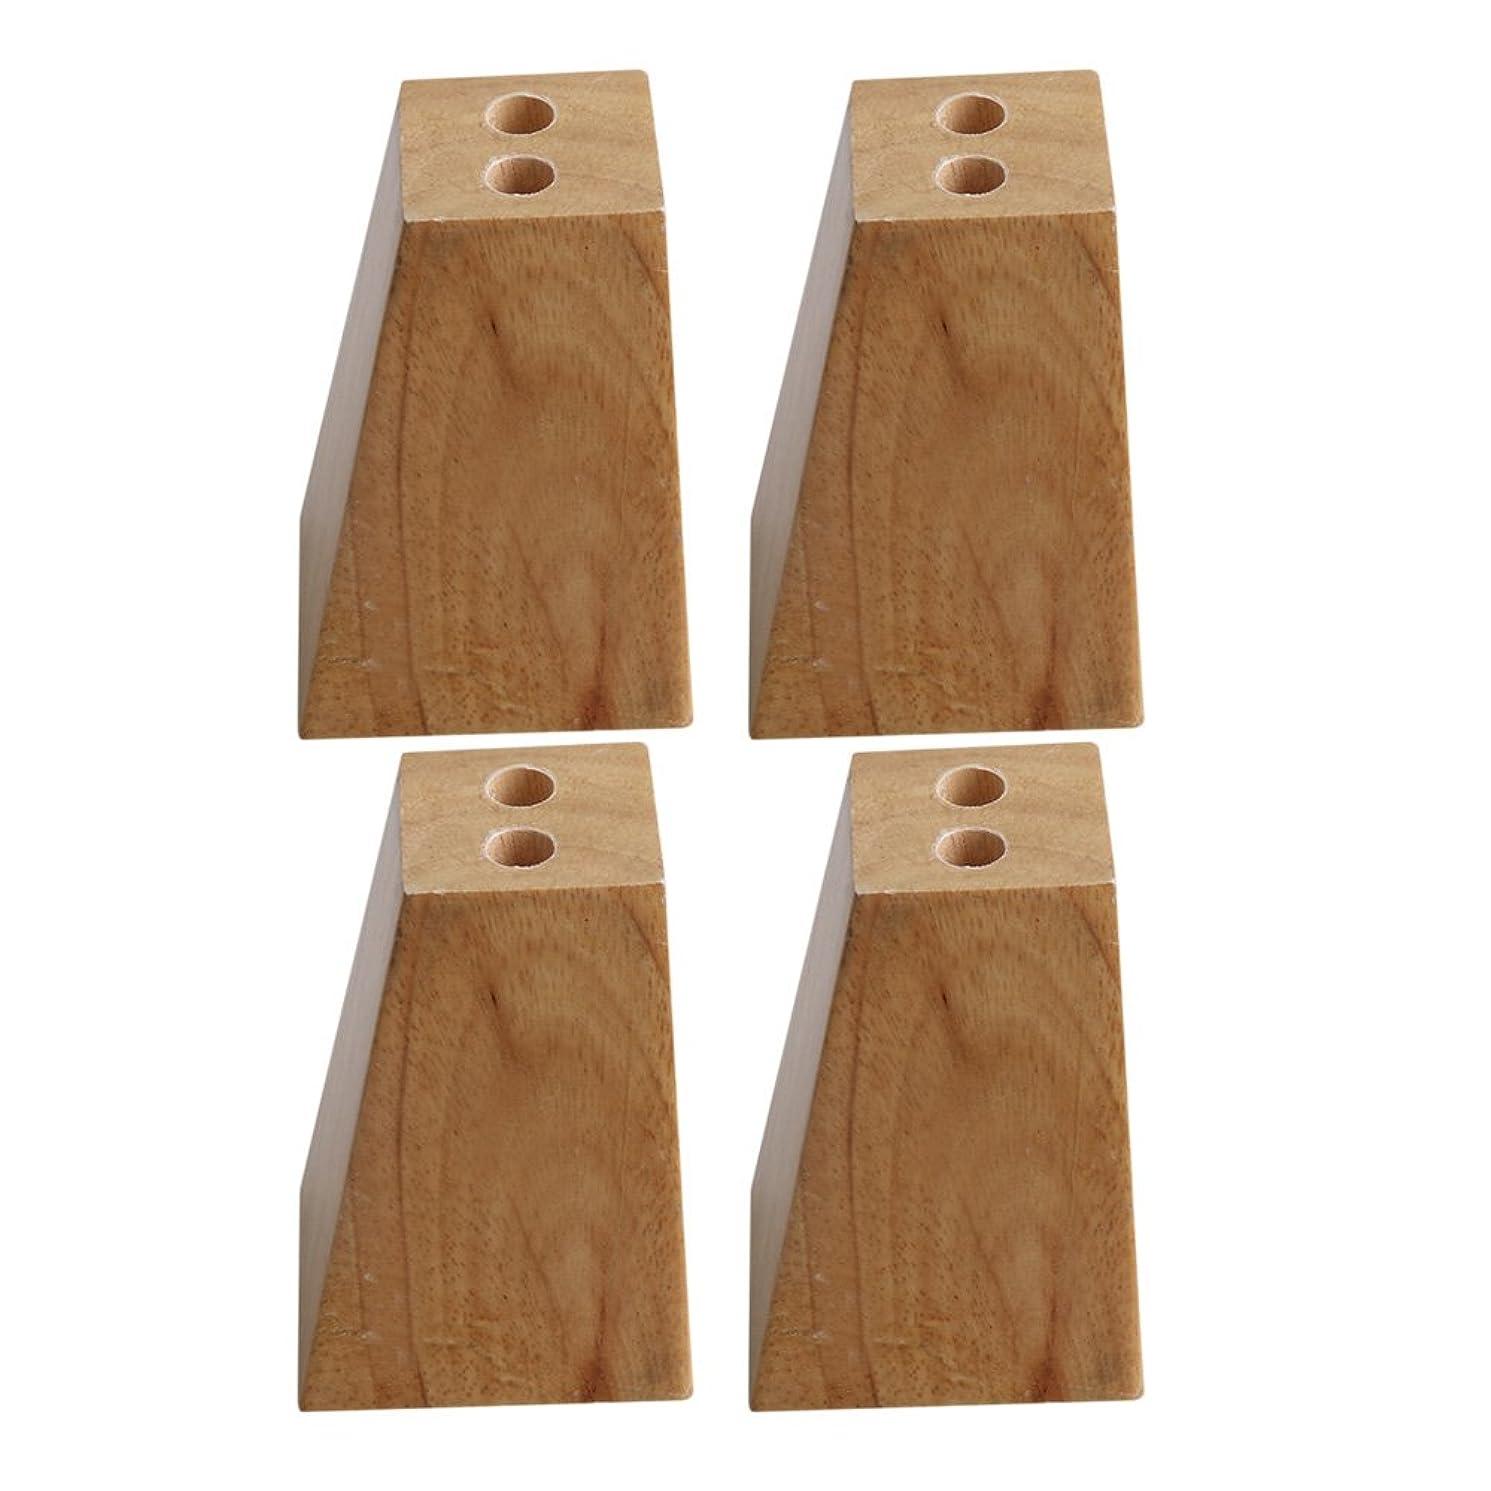 4Pcs 82mm Height Oak Wood Furniture Legs Couch Dresser Armchair Feet Burlywood